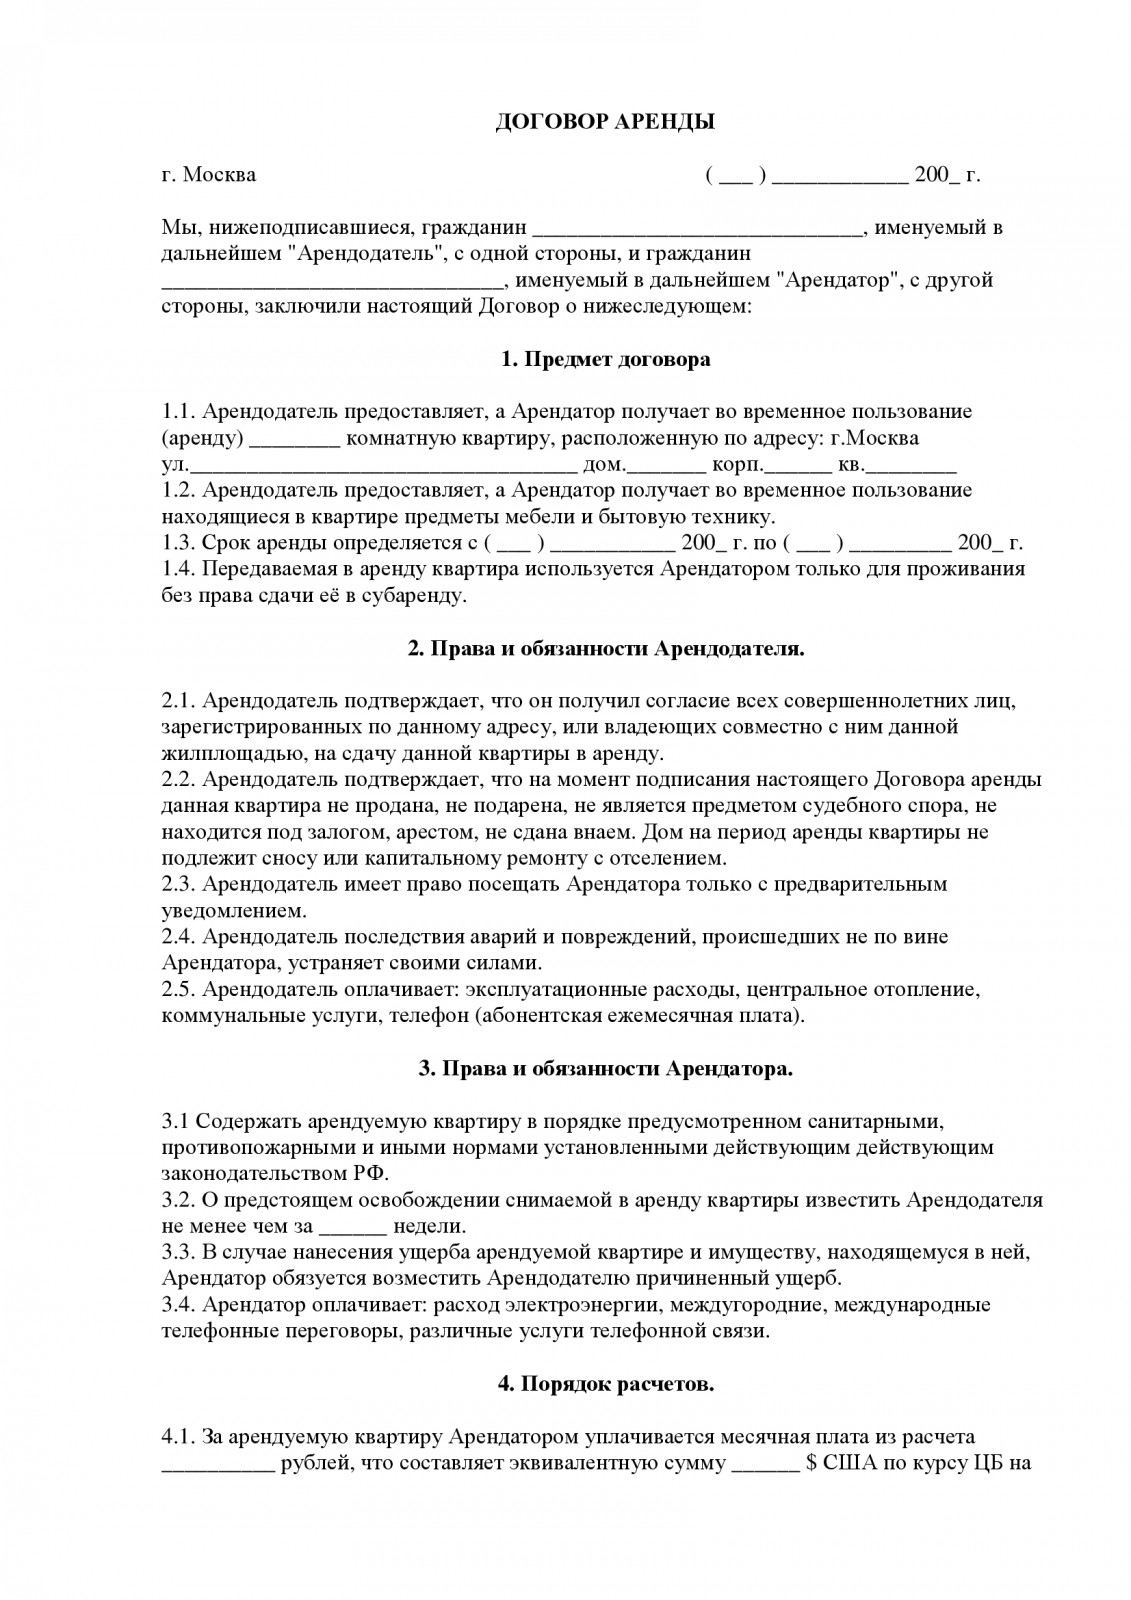 форма договора аренды